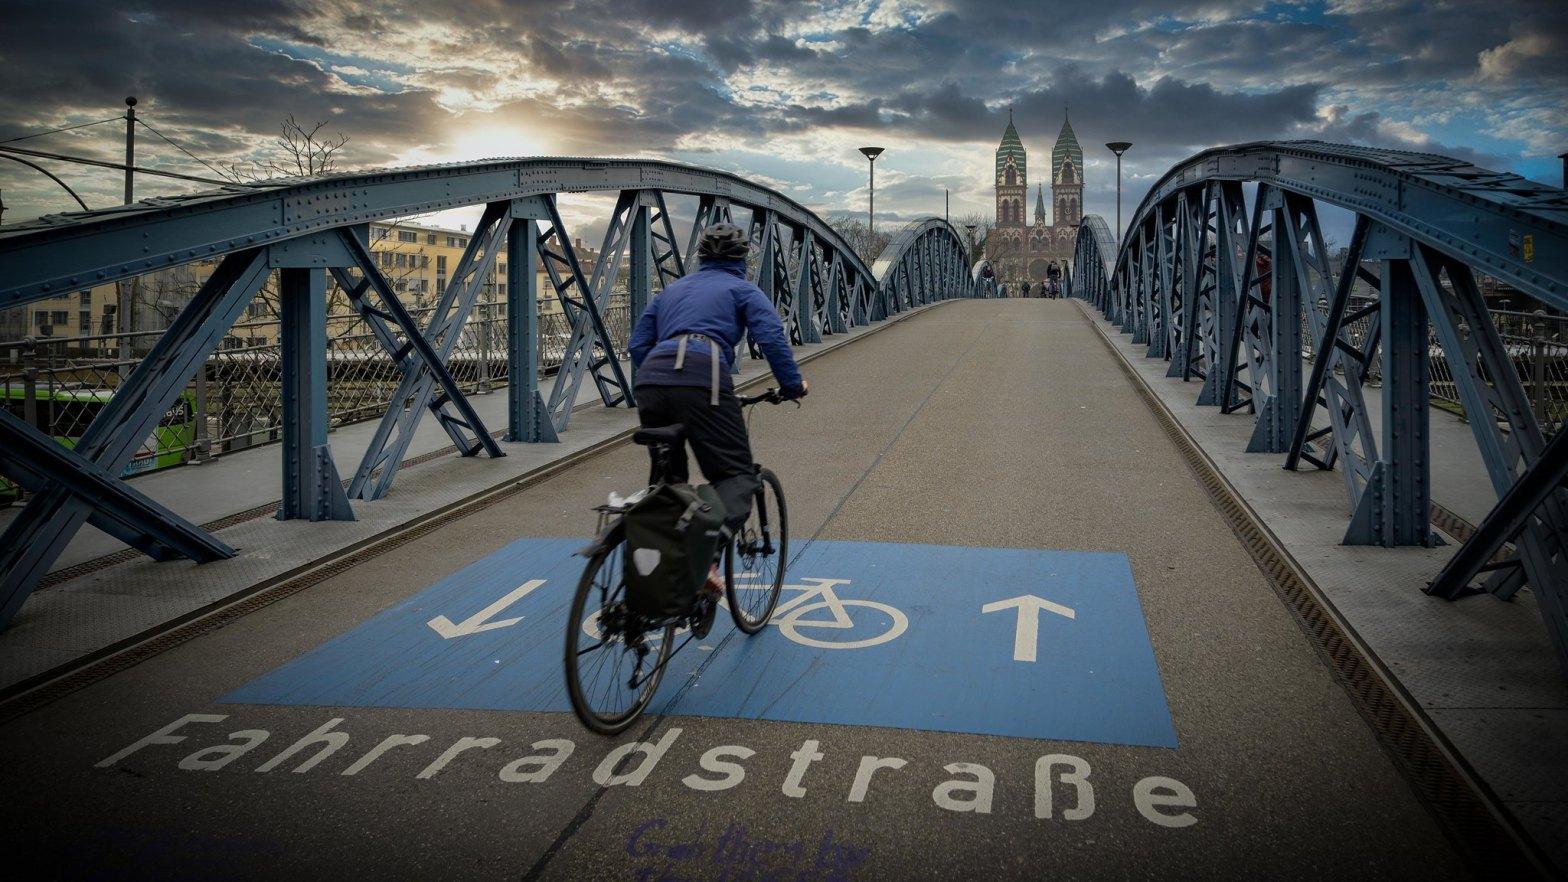 Bike street (Fahrradstraße). Bike path crossing bridge over the railway station in Freiburg (im Breisgau), Southern Germany.